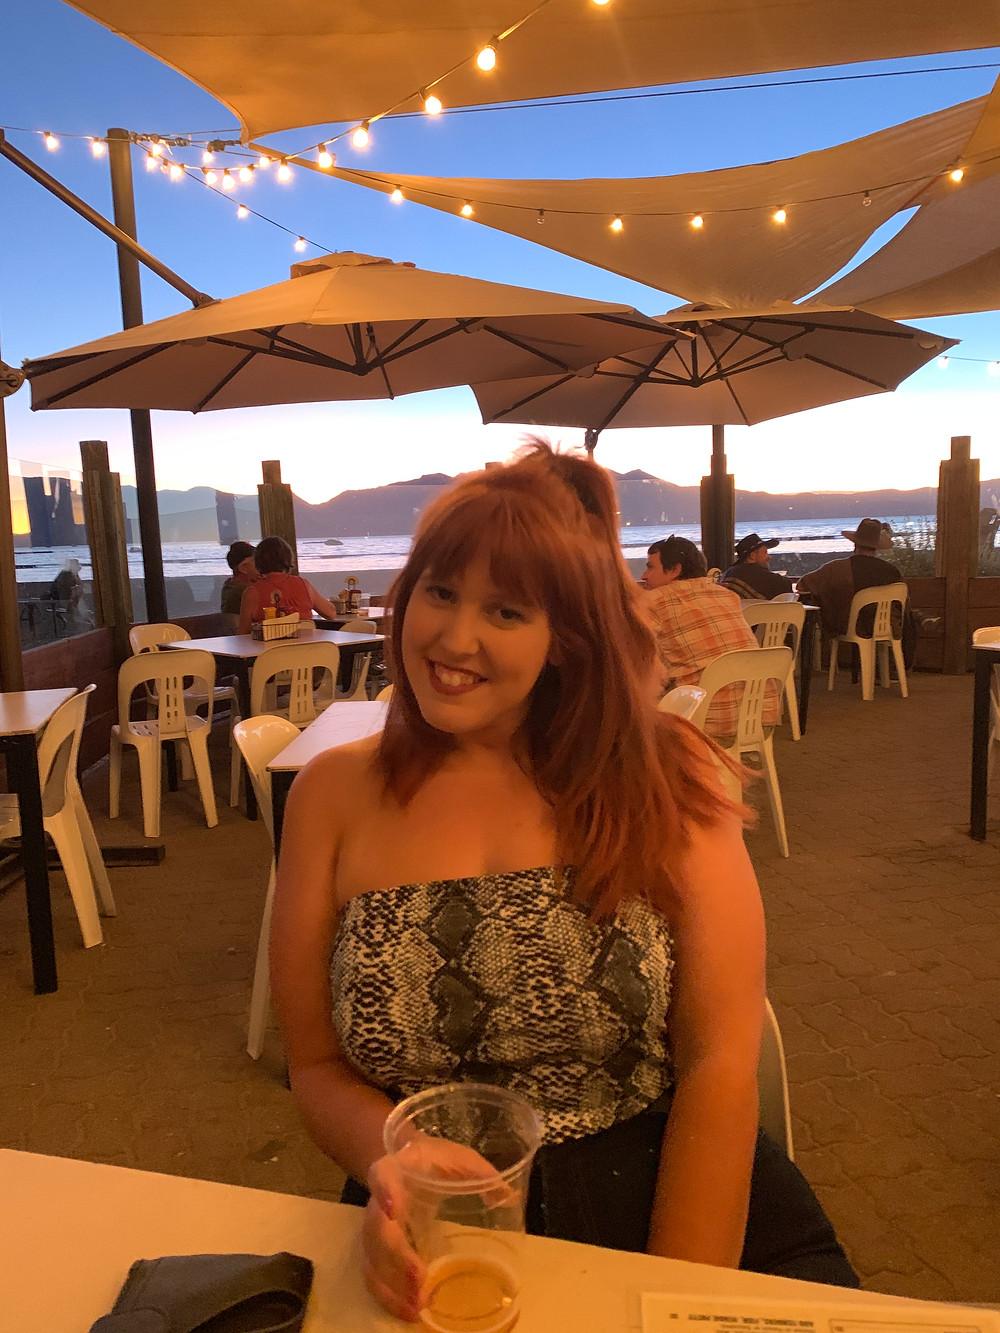 Beach House Restaurant in South Lake Tahoe